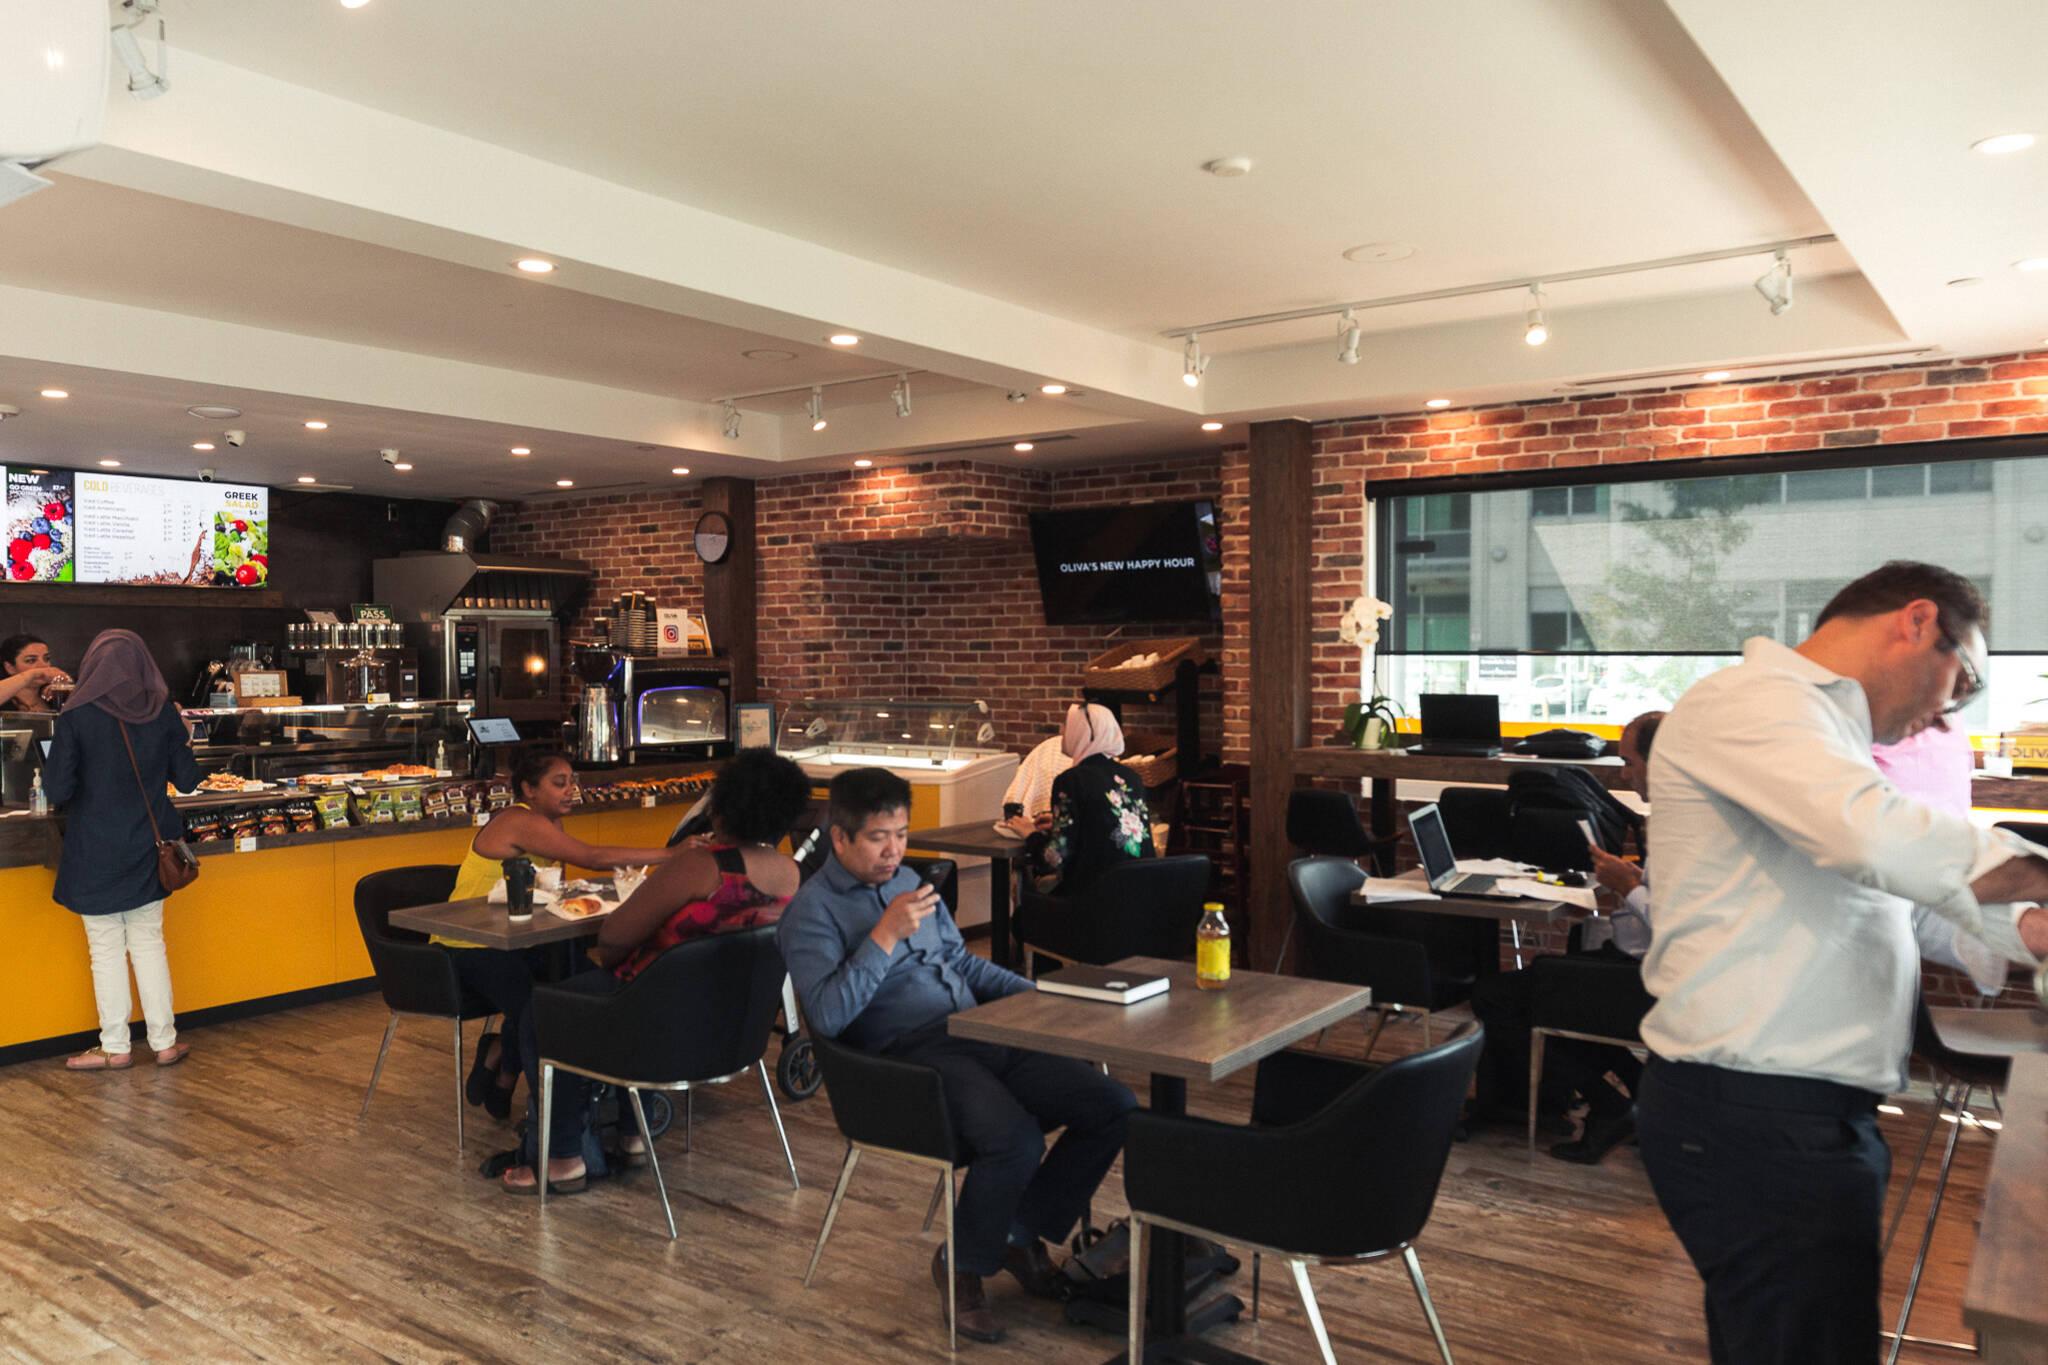 Oliva cafe Toronto